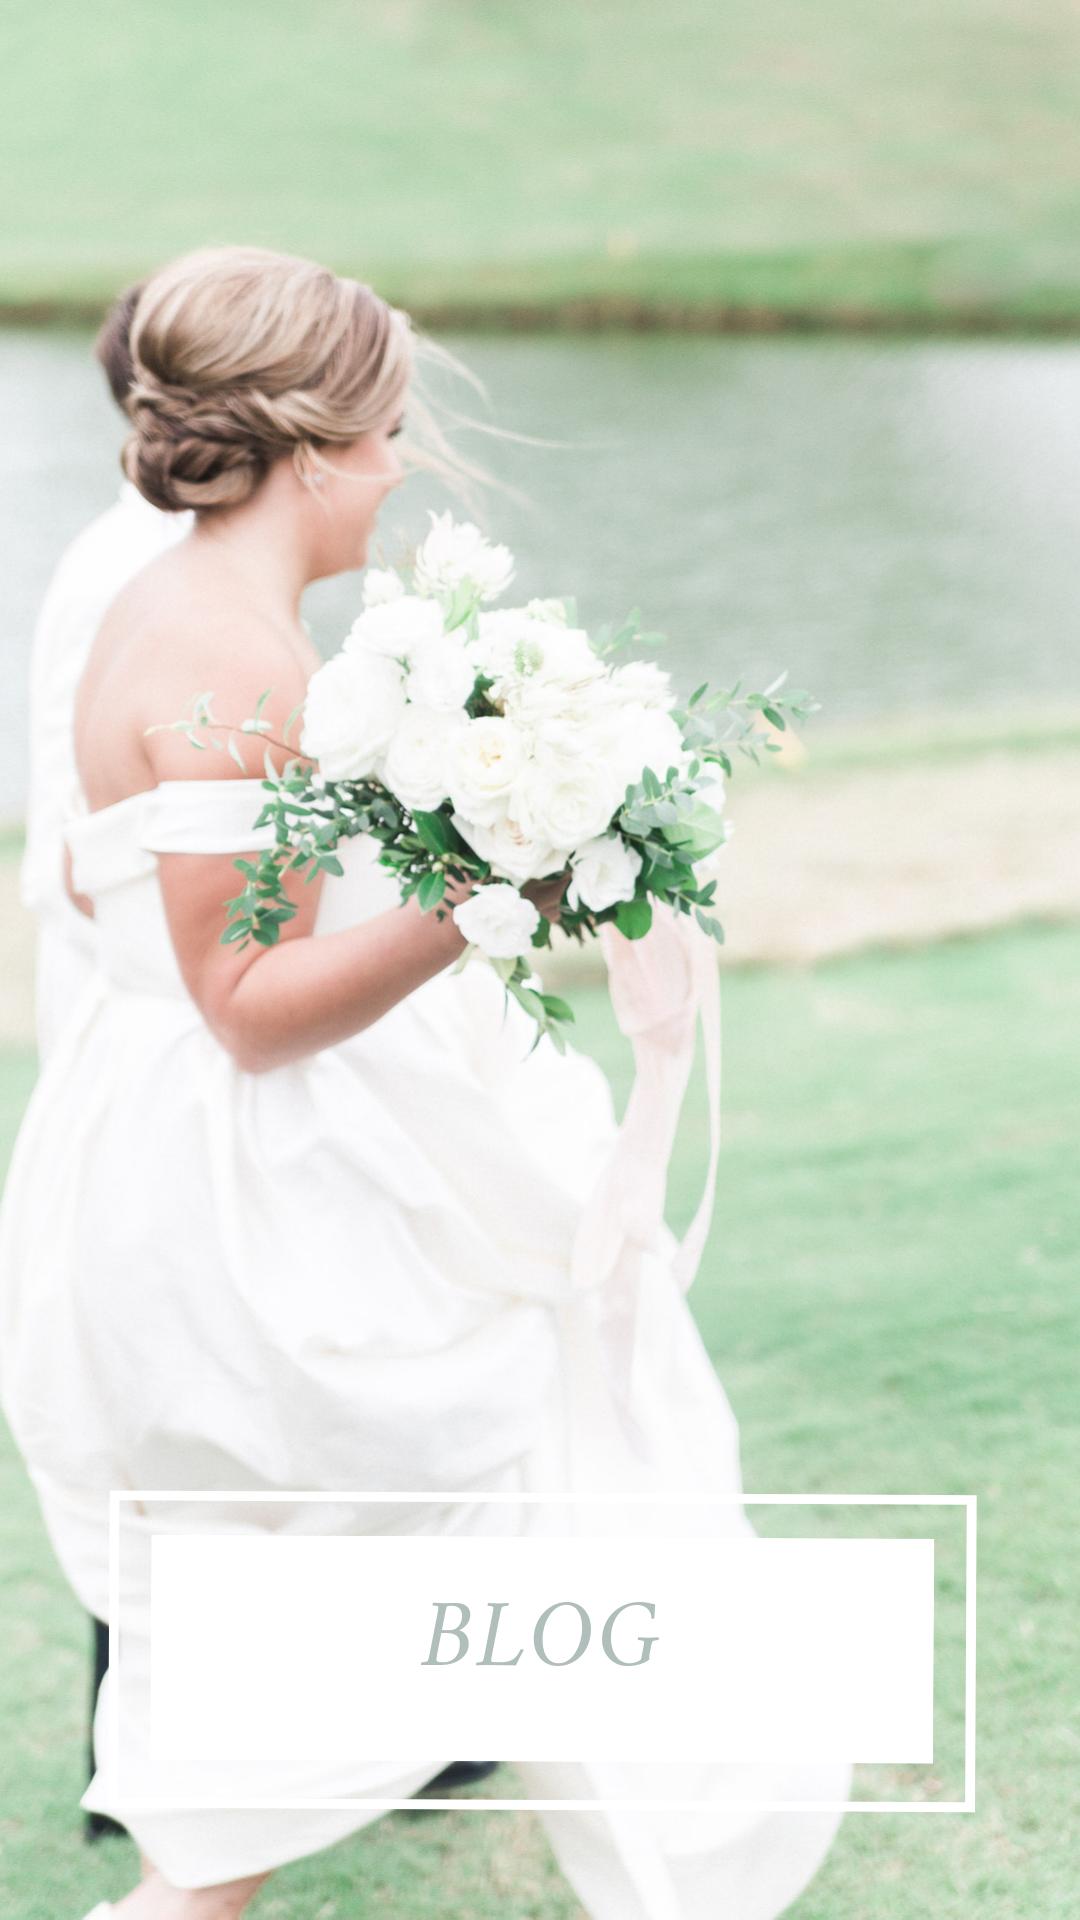 Bespoken Events | Blog | Wedding Planning